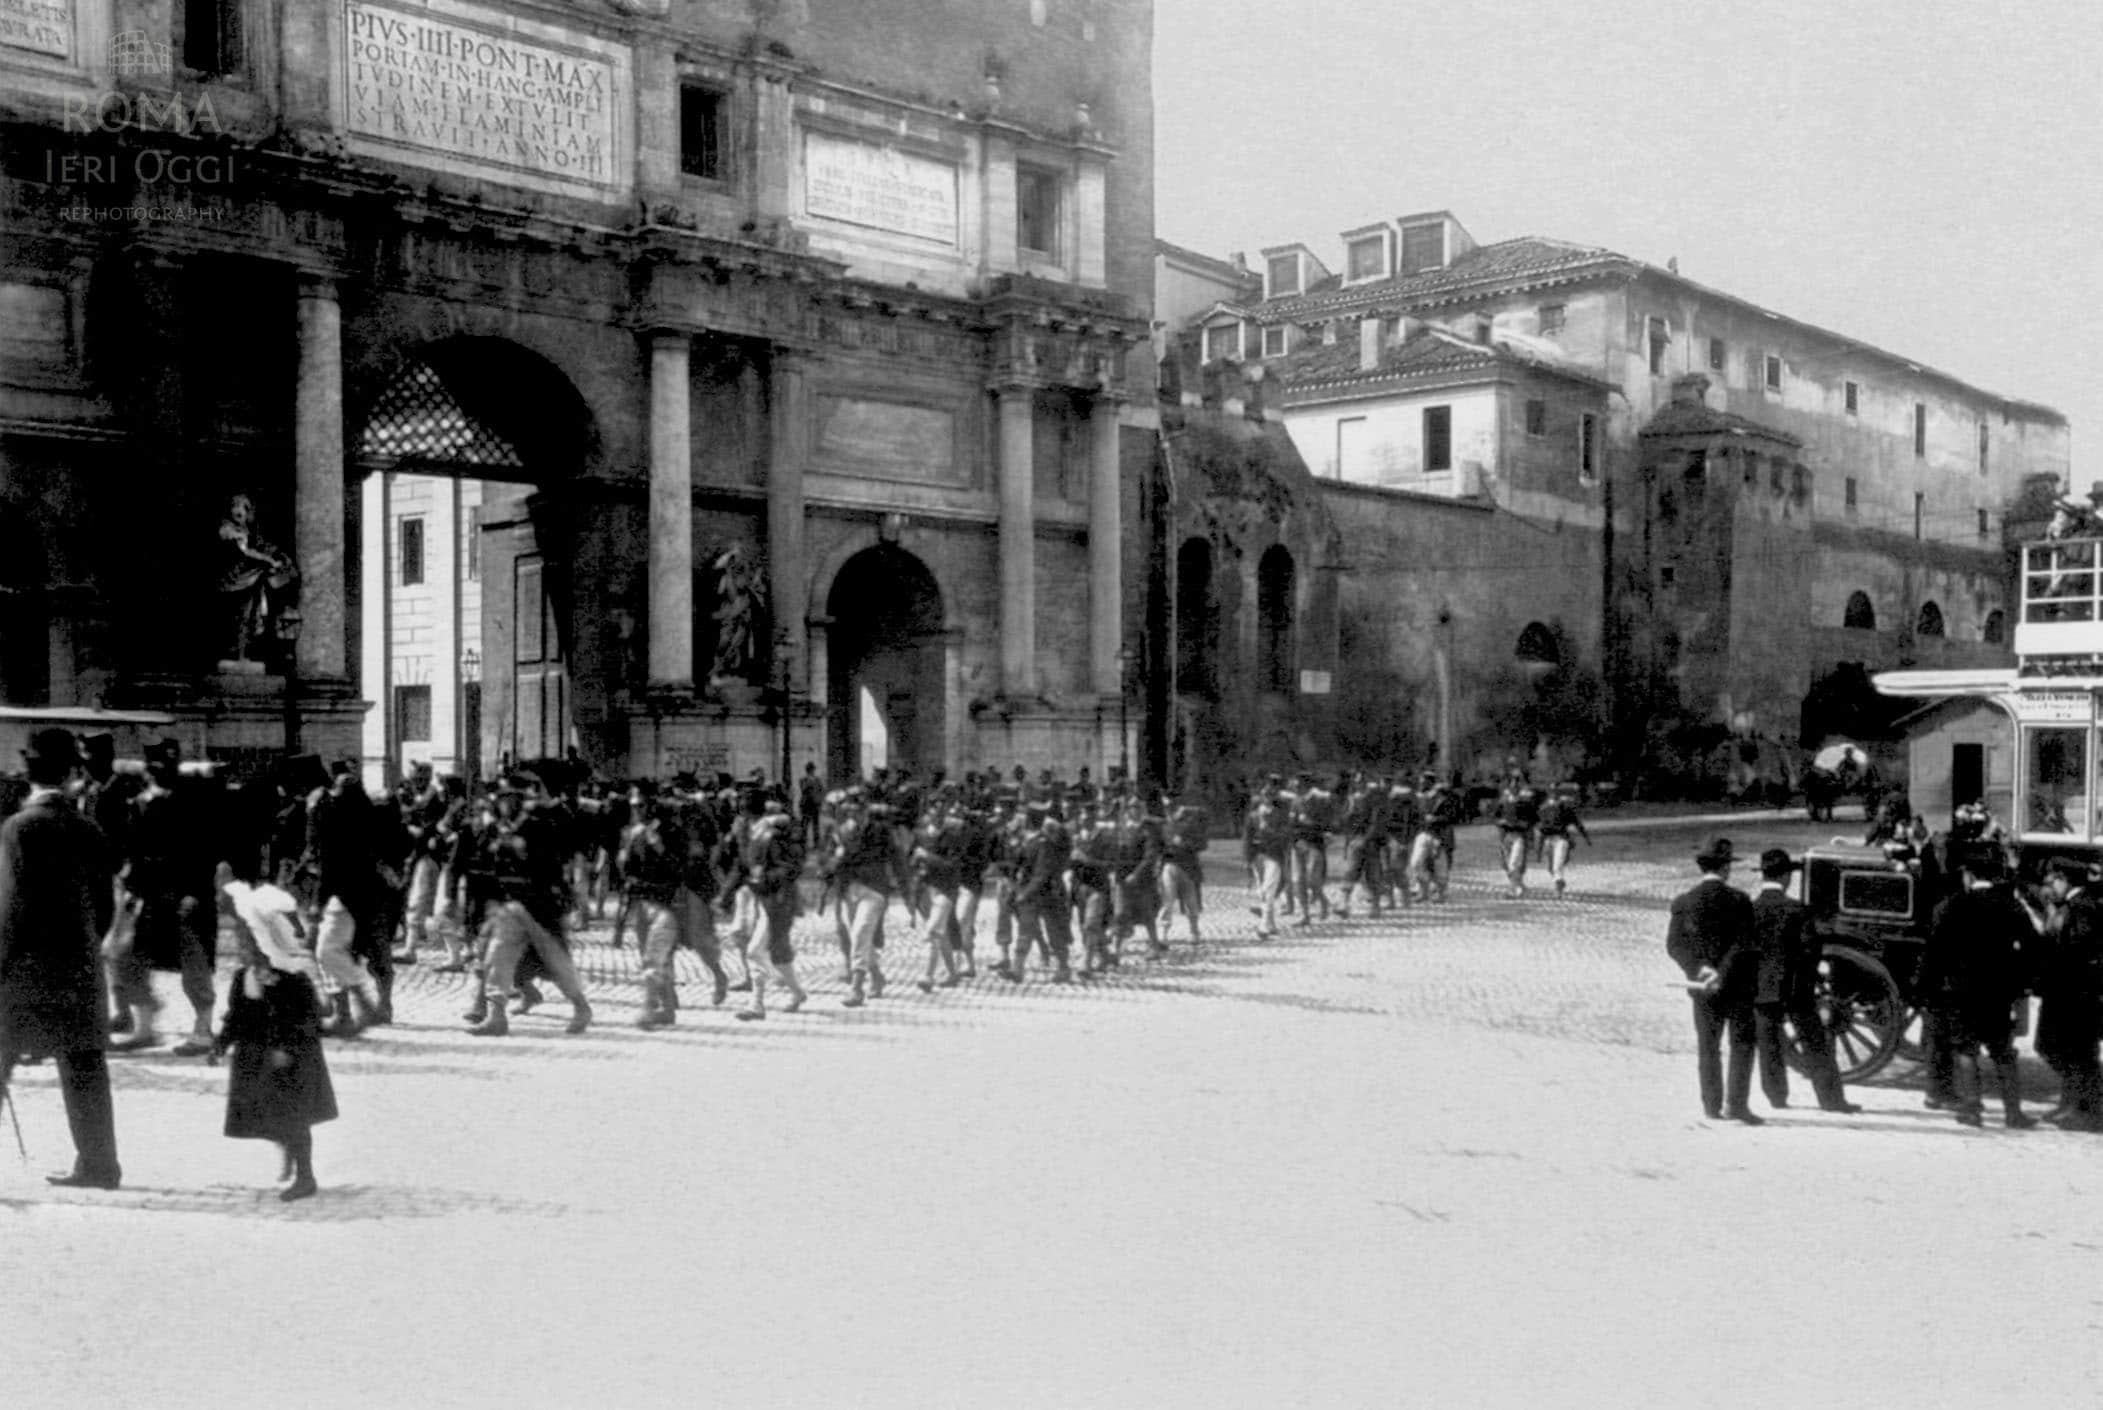 Piazzale flaminio 1903 roma ieri oggi - Porta portese messaggi ...